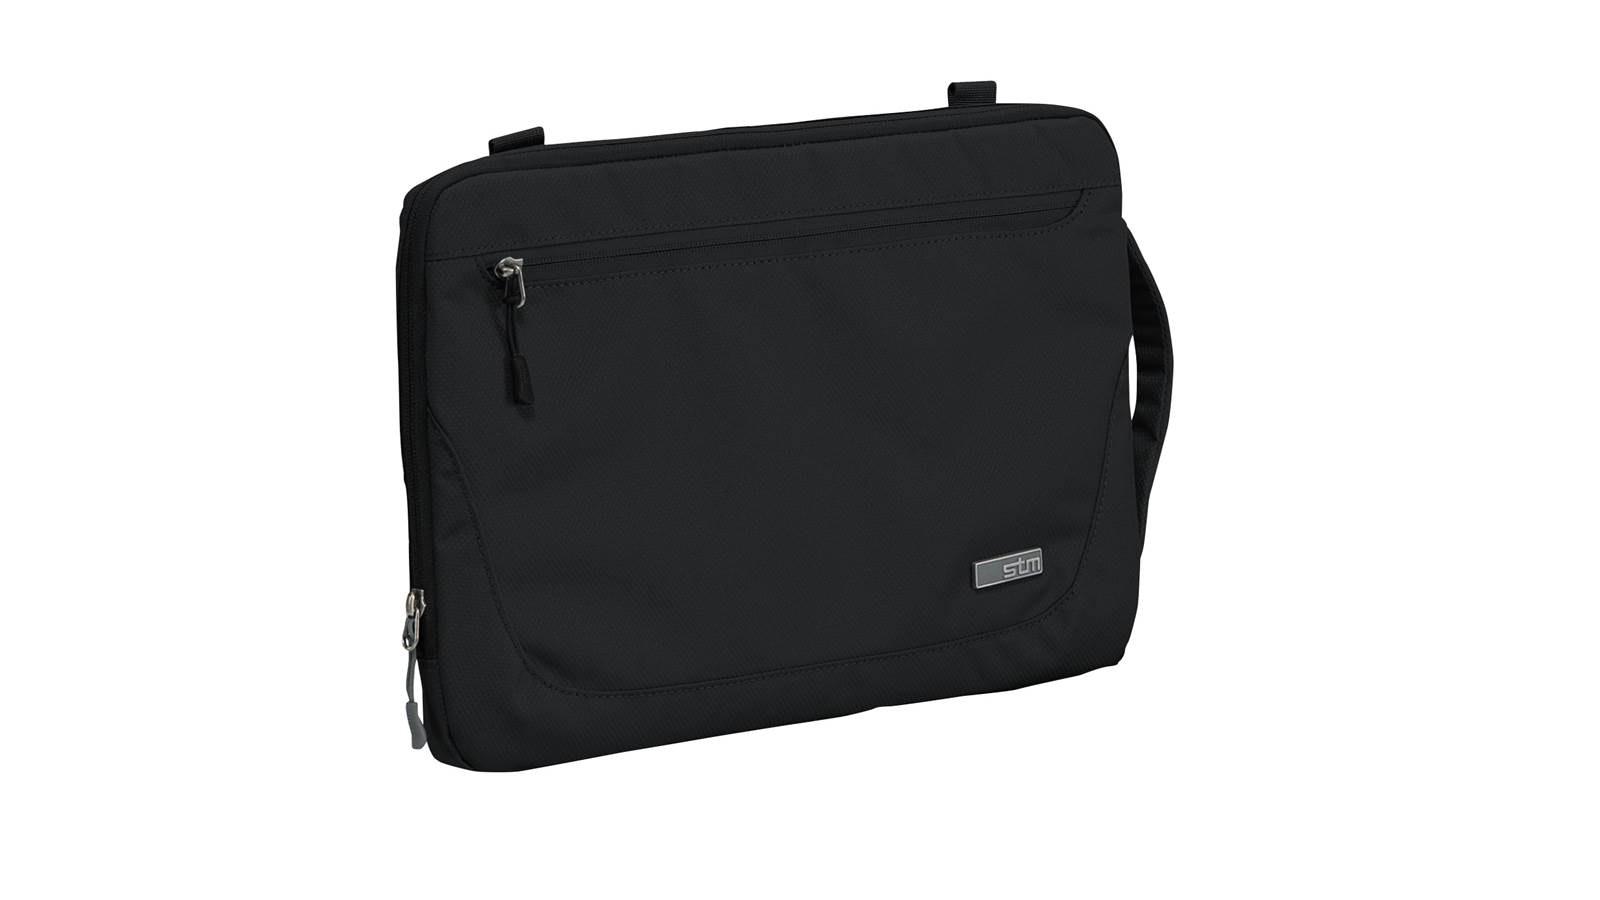 stm blazer 13 u0026quot  laptop sleeve